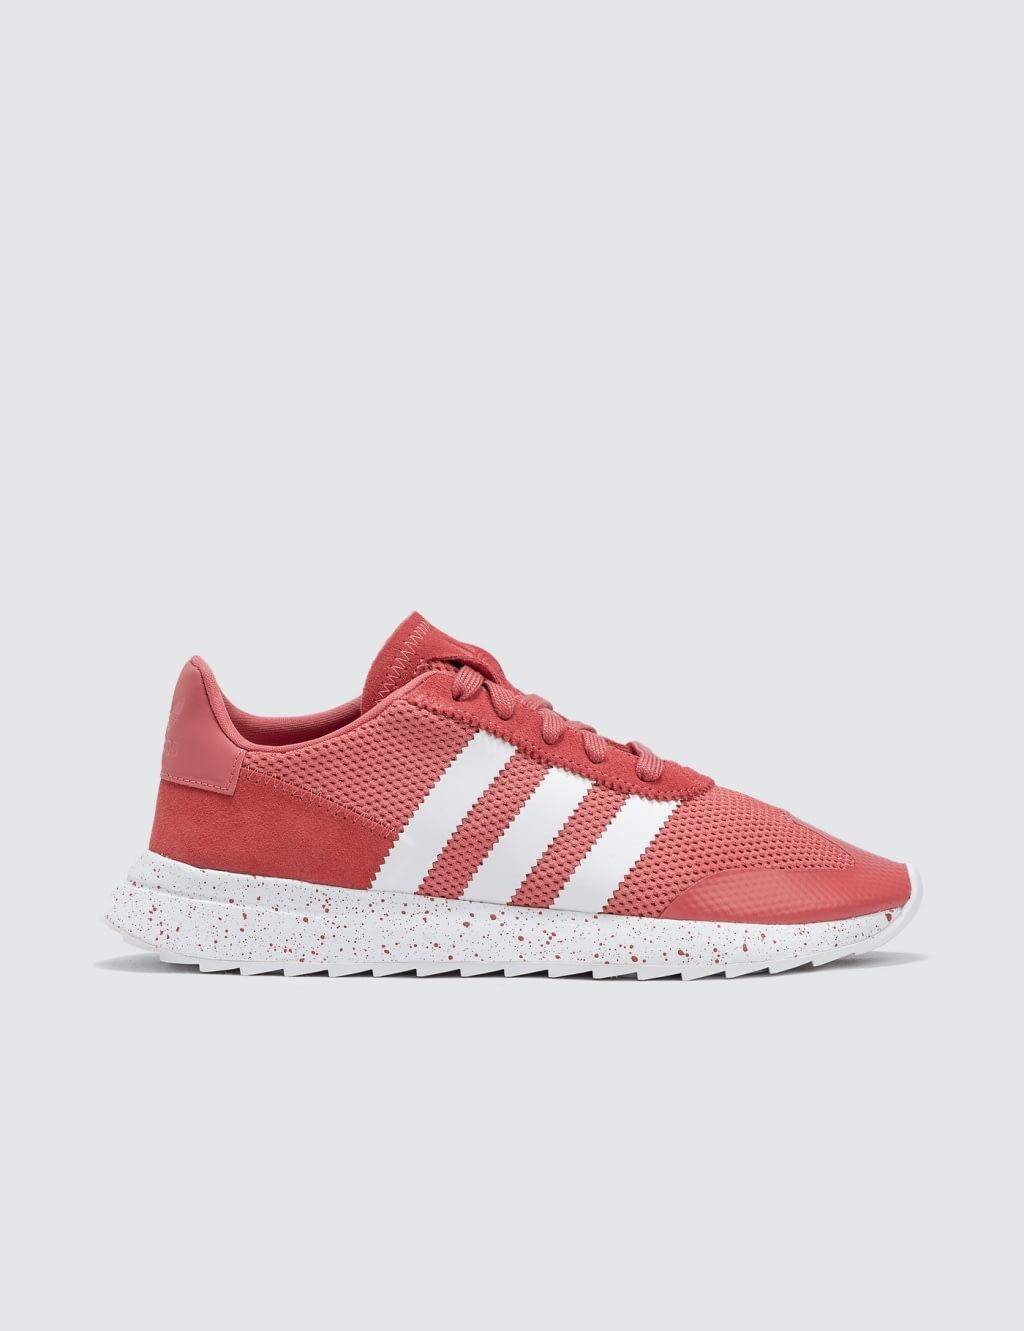 adidas Originals FLB_Runner W cgtgpw3